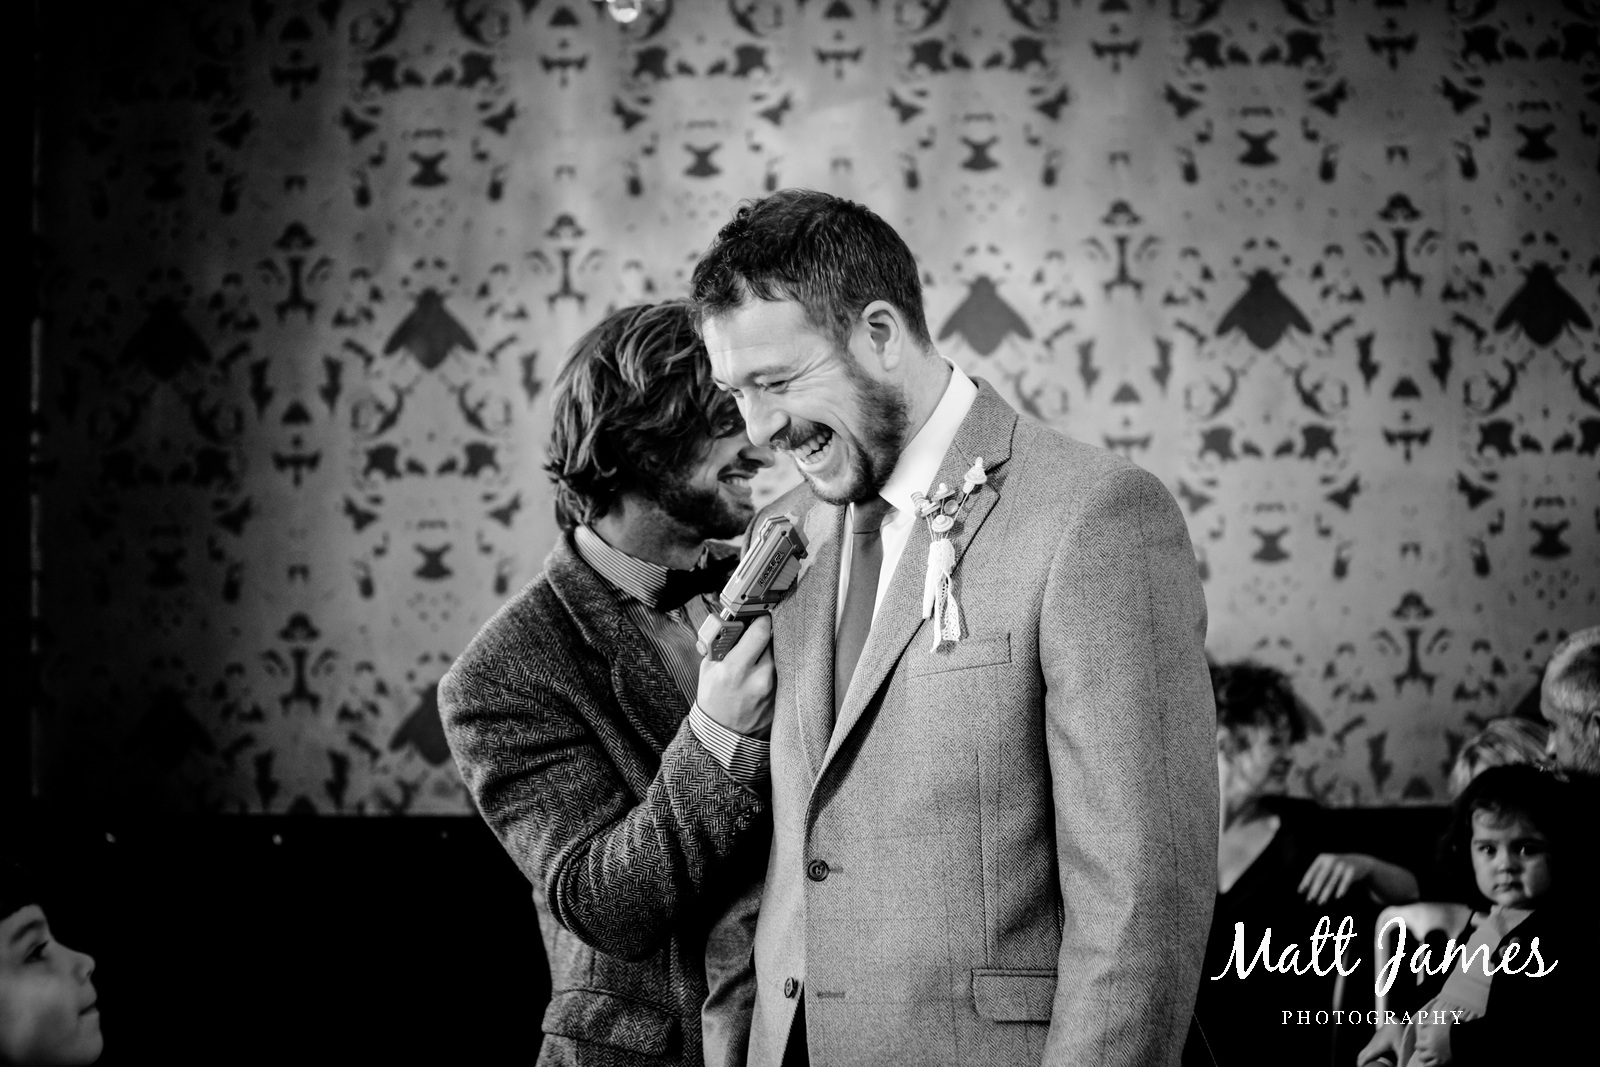 Sevenoaks-documentary-wedding-photographer-250